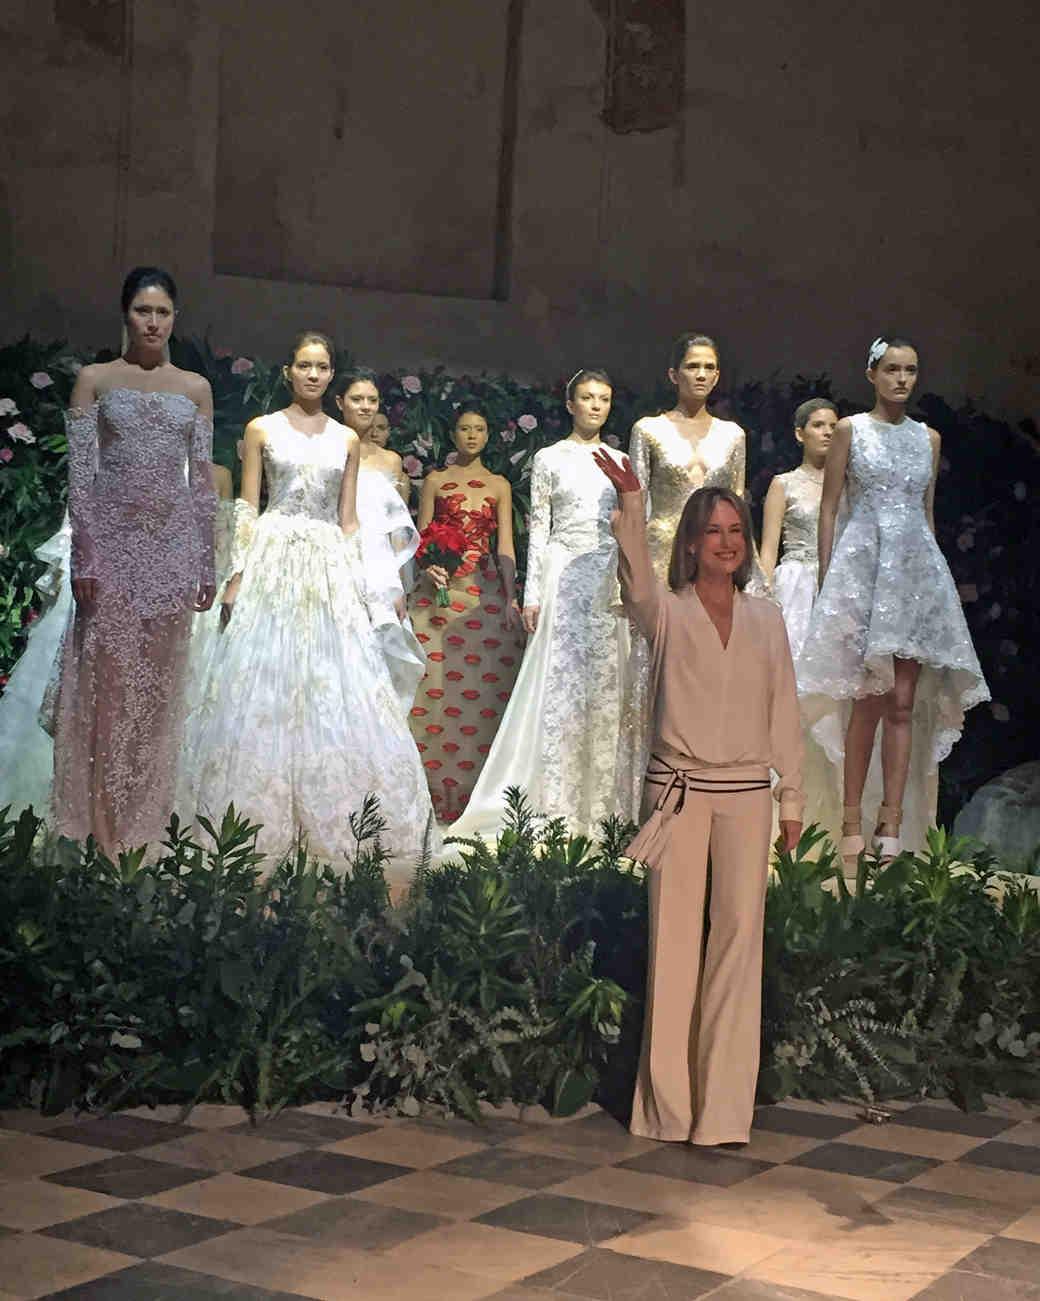 cartagena-bridal-week-tcherassi-7861-2-0915.jpg